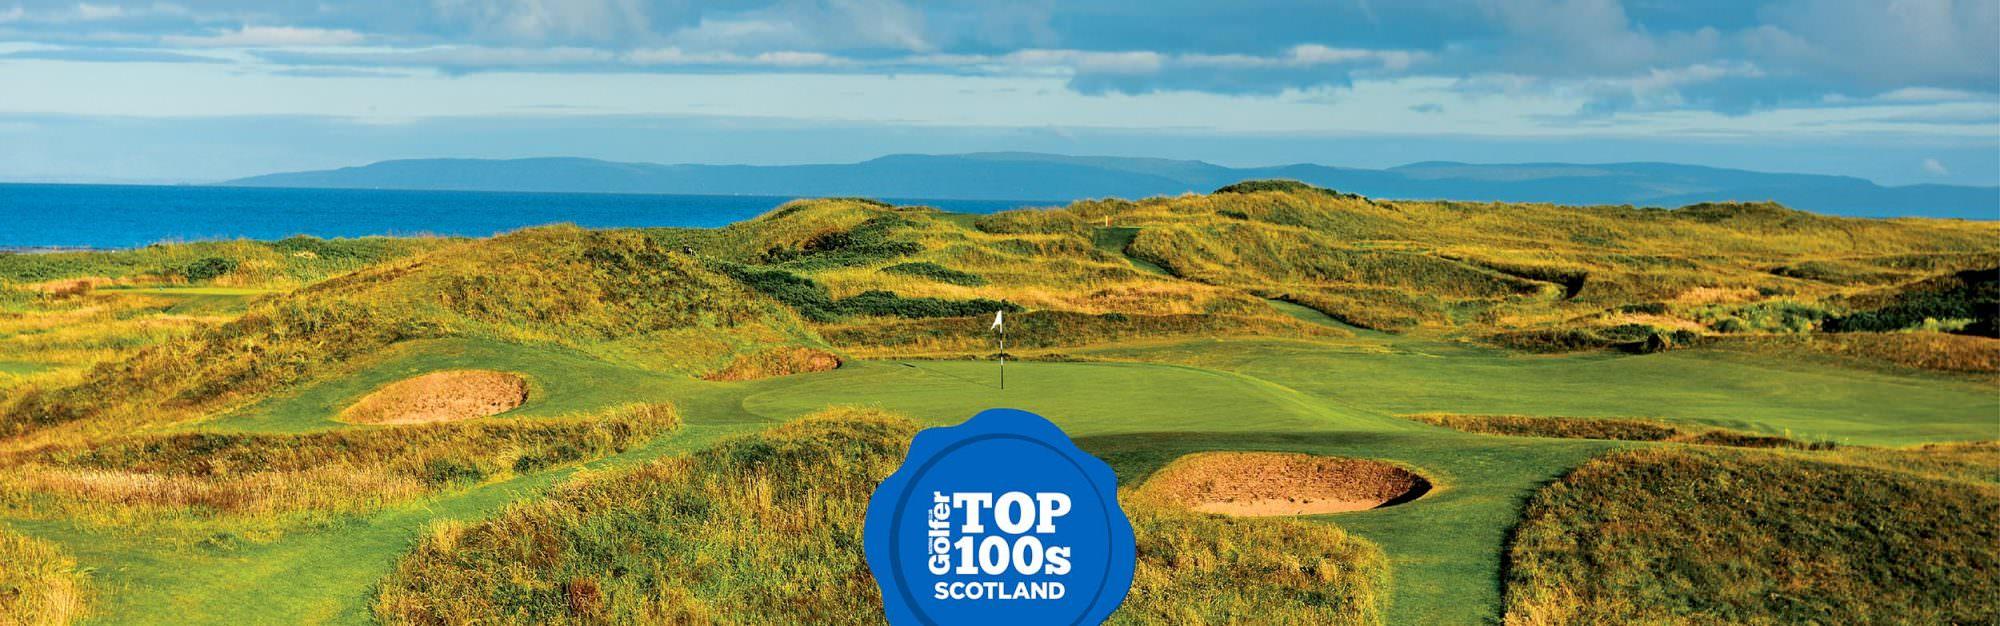 NCG's Top 100 Golf Courses in Scotland